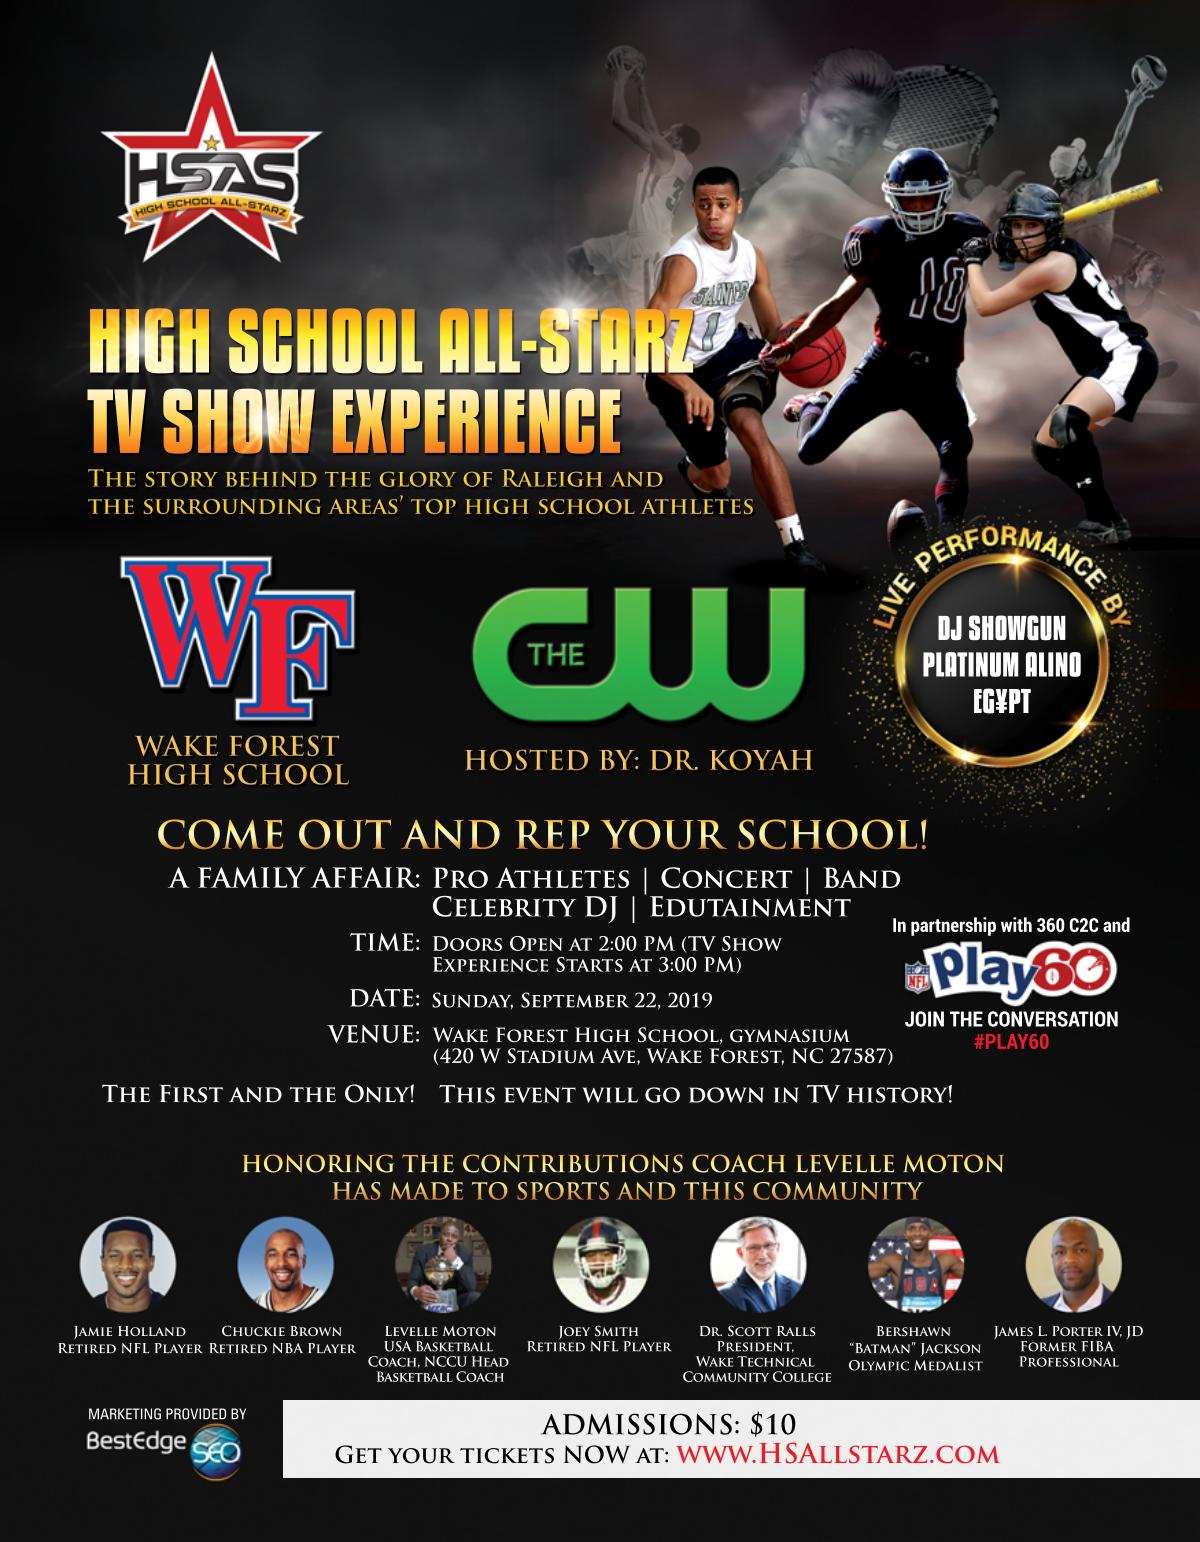 High School All-Starz TV Show taping invitation flyer